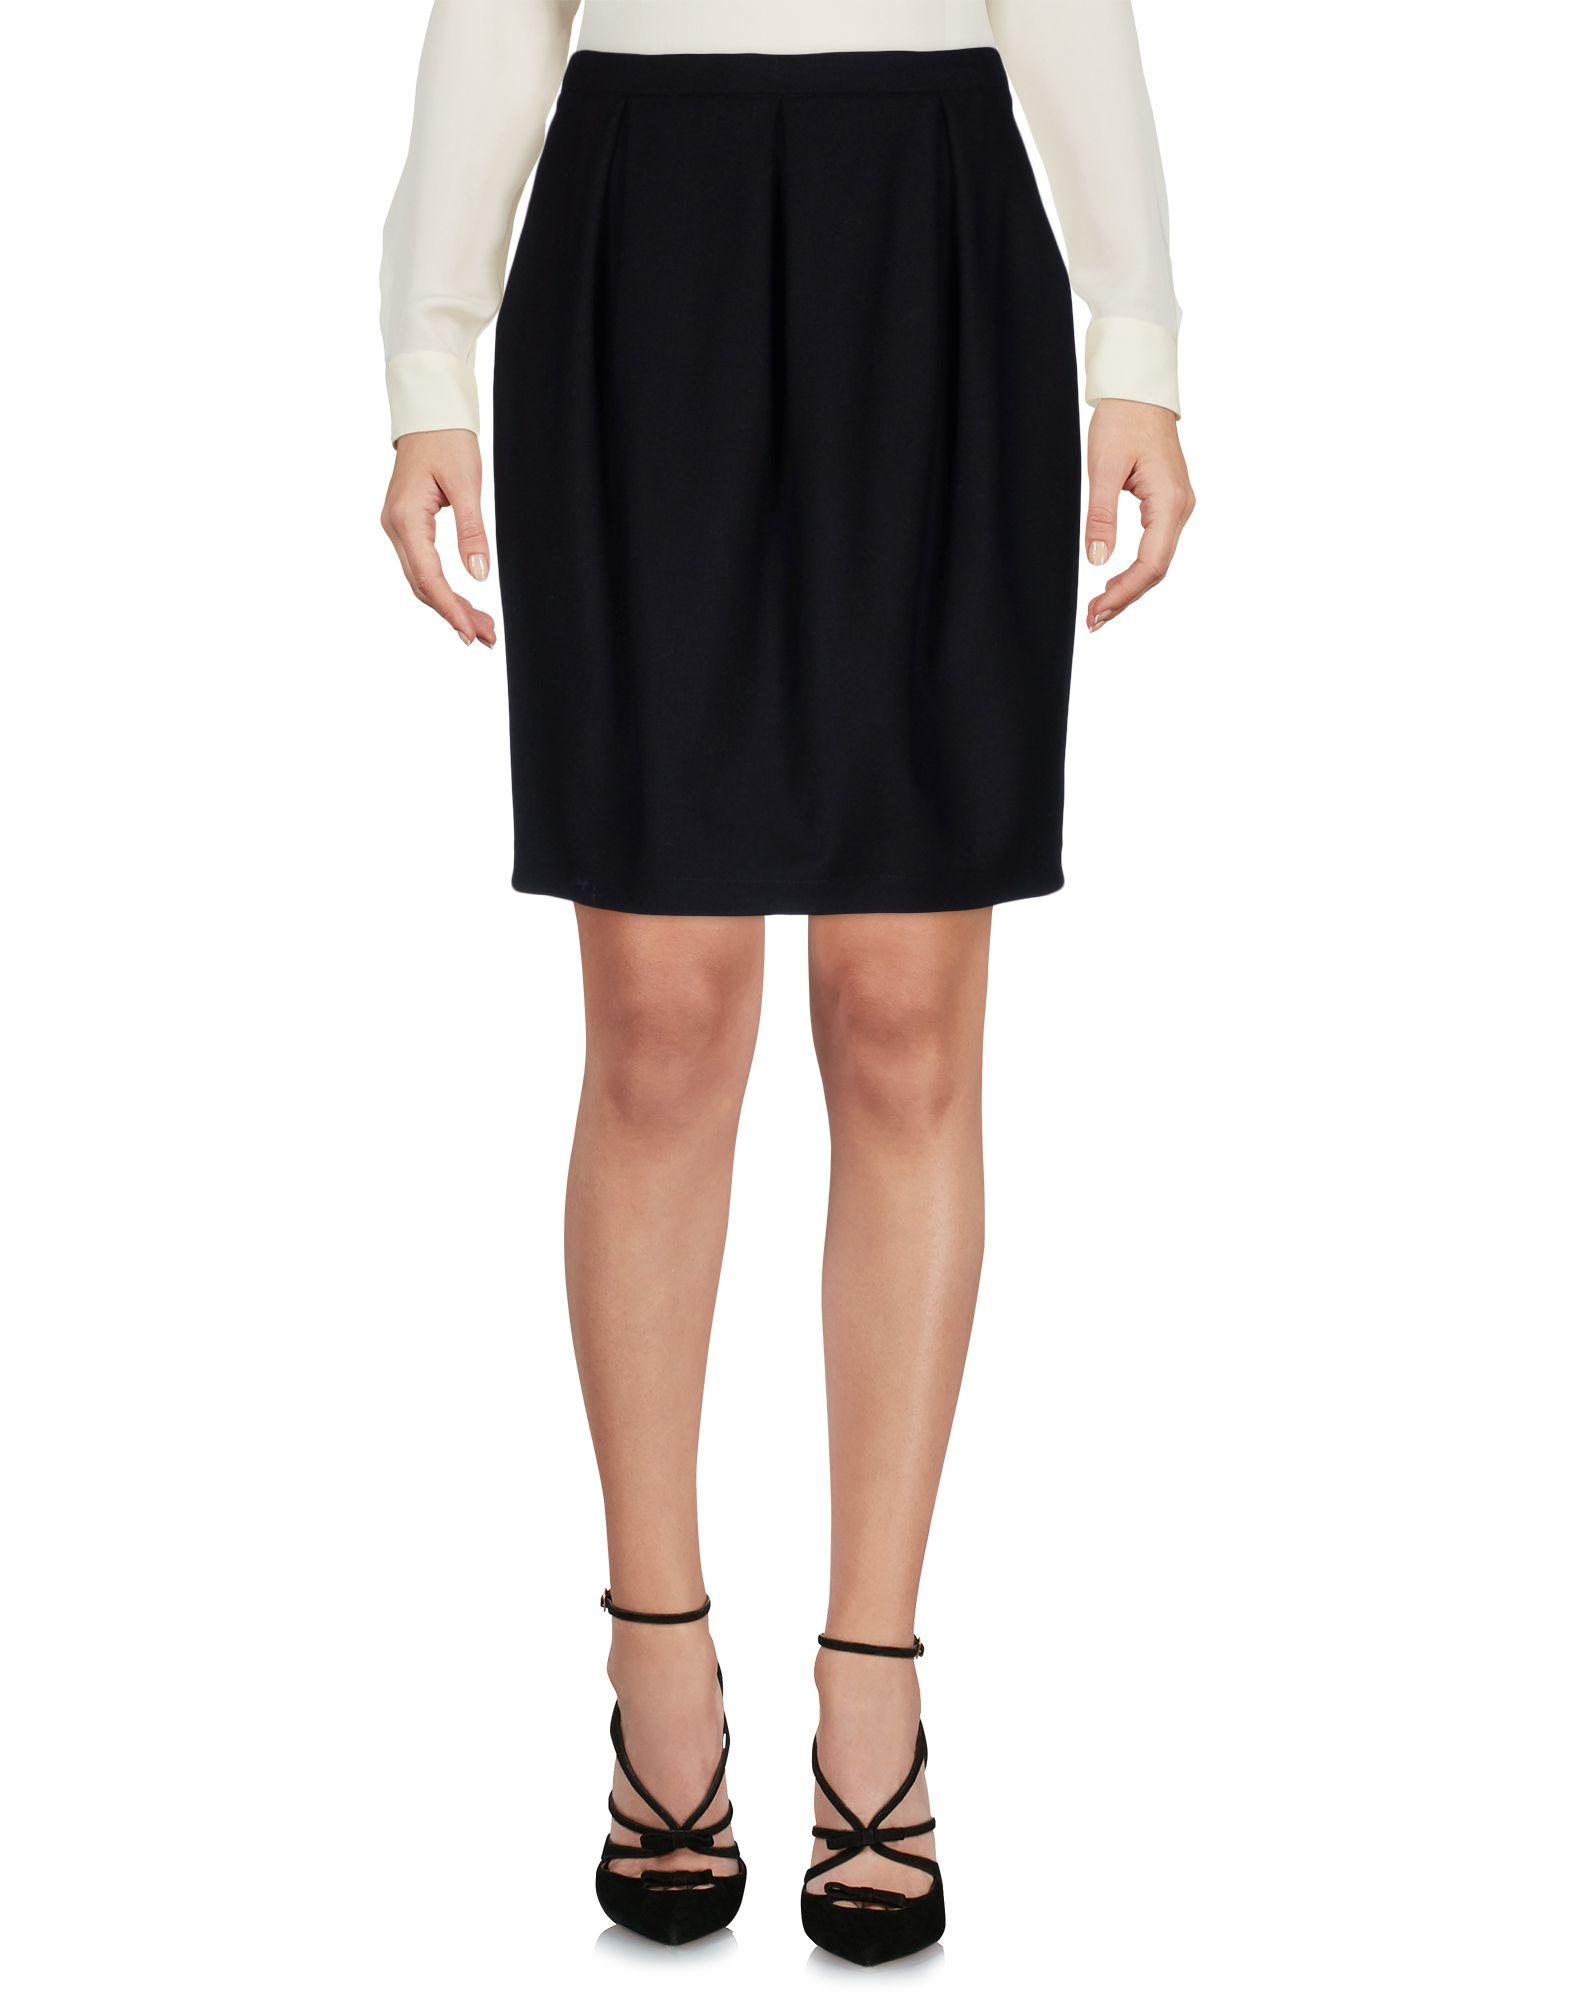 LAURA URBINATI Knee Length Skirt in Black